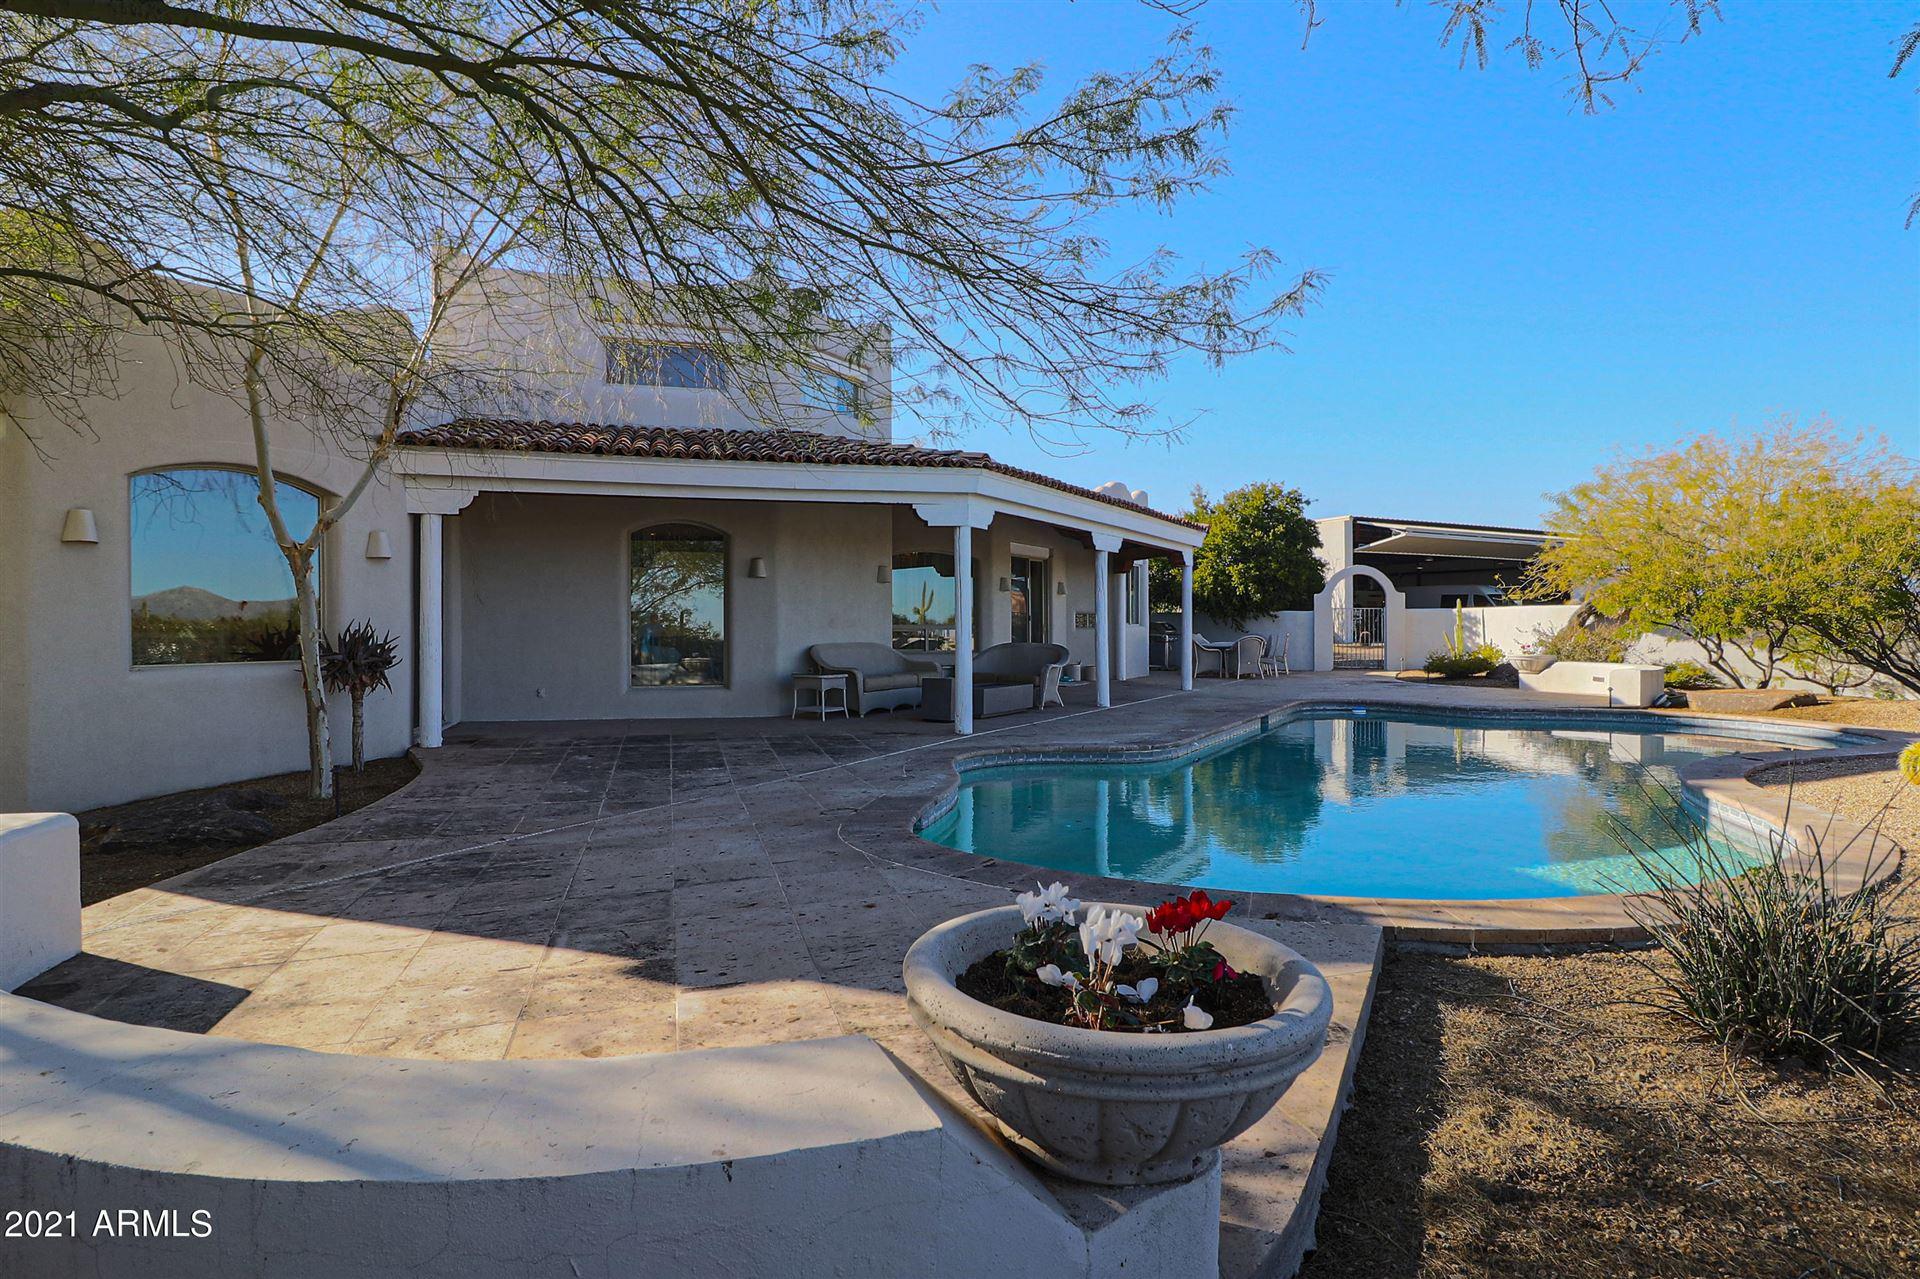 Photo of 37526 N 237TH Avenue, Morristown, AZ 85342 (MLS # 6298540)